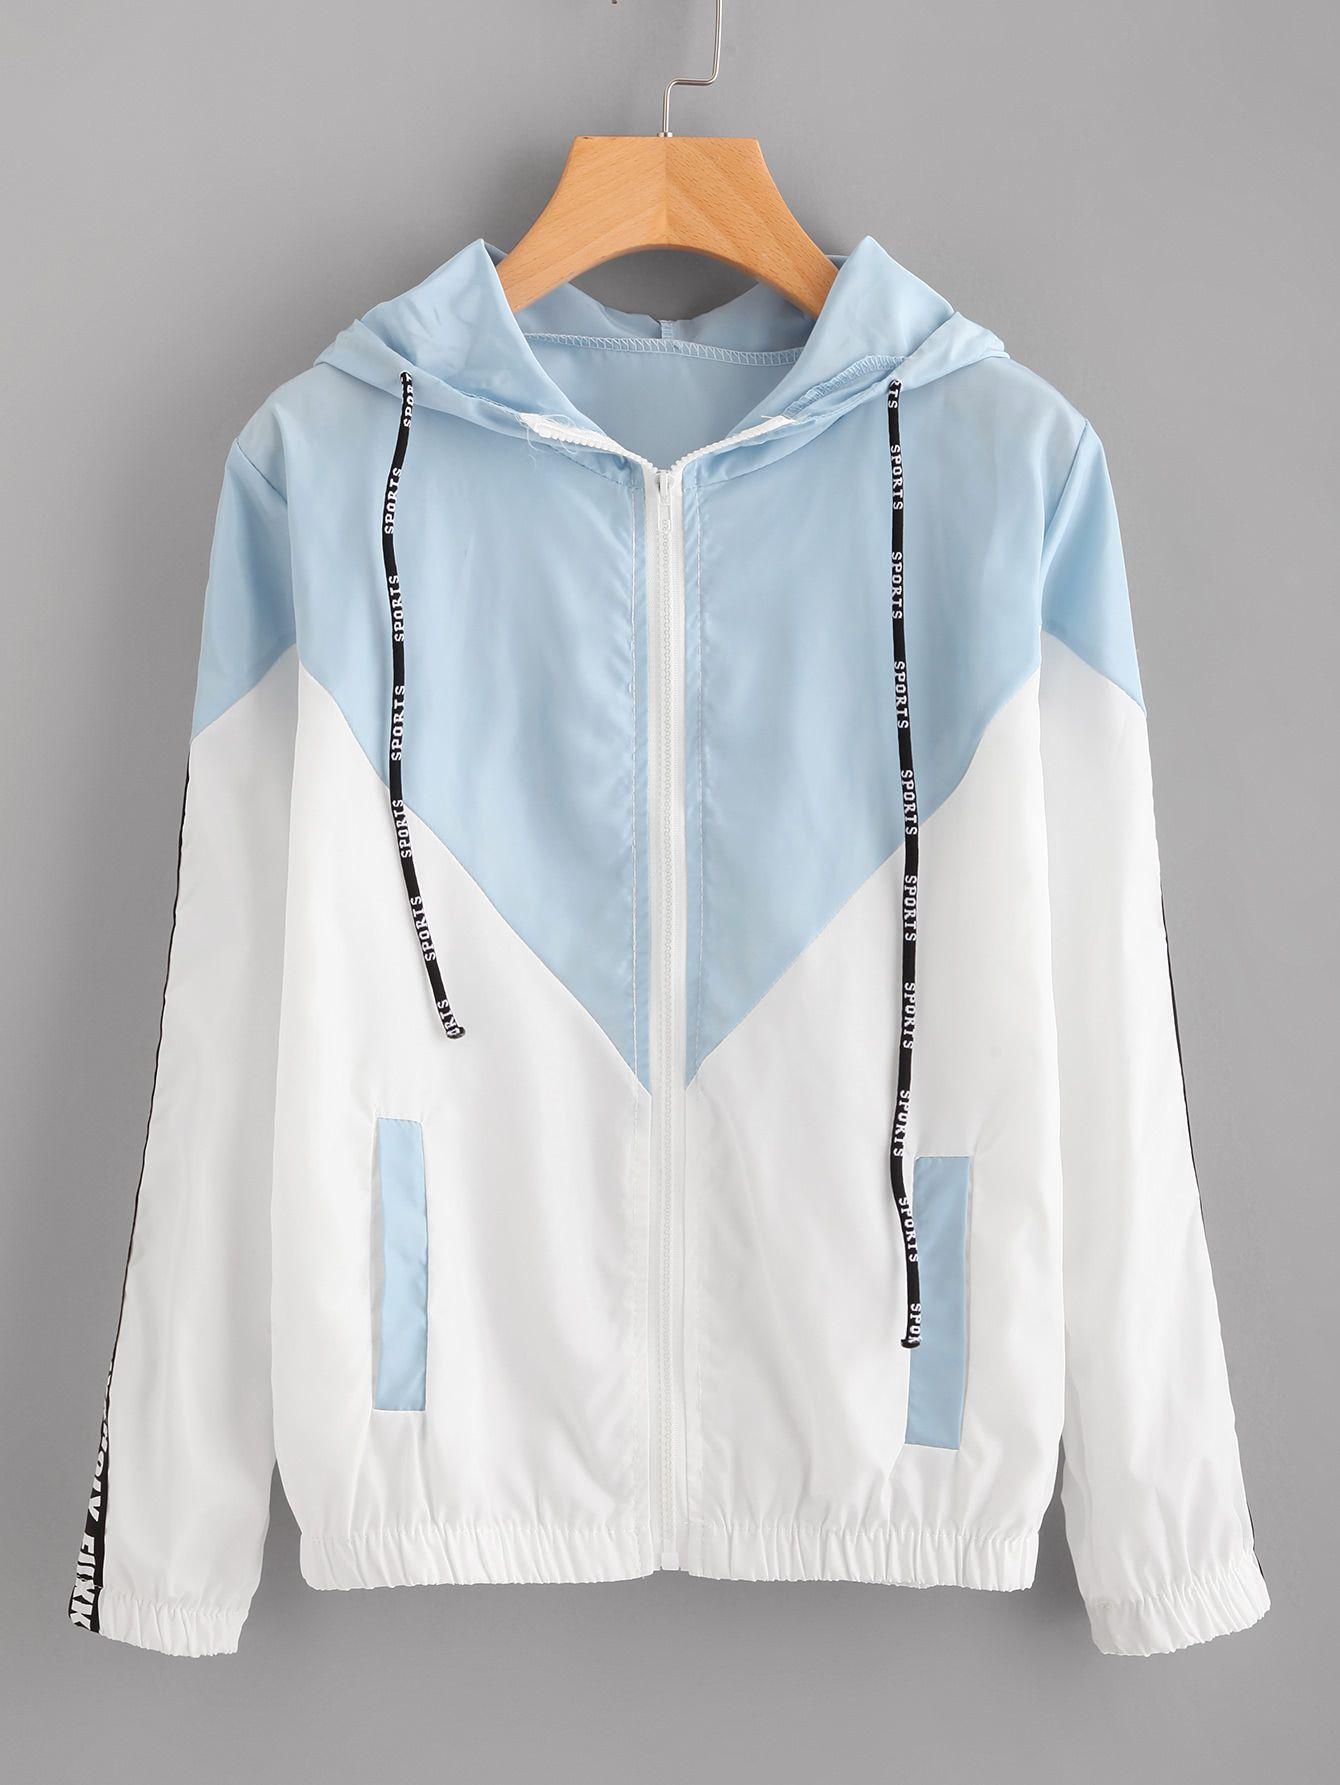 4a537930c7 Shop Hooded Drawstring Color Block Zip Up Jacket online. SheIn offers Hooded  Drawstring Color Block Zip Up Jacket & more to fit your fashionable needs.